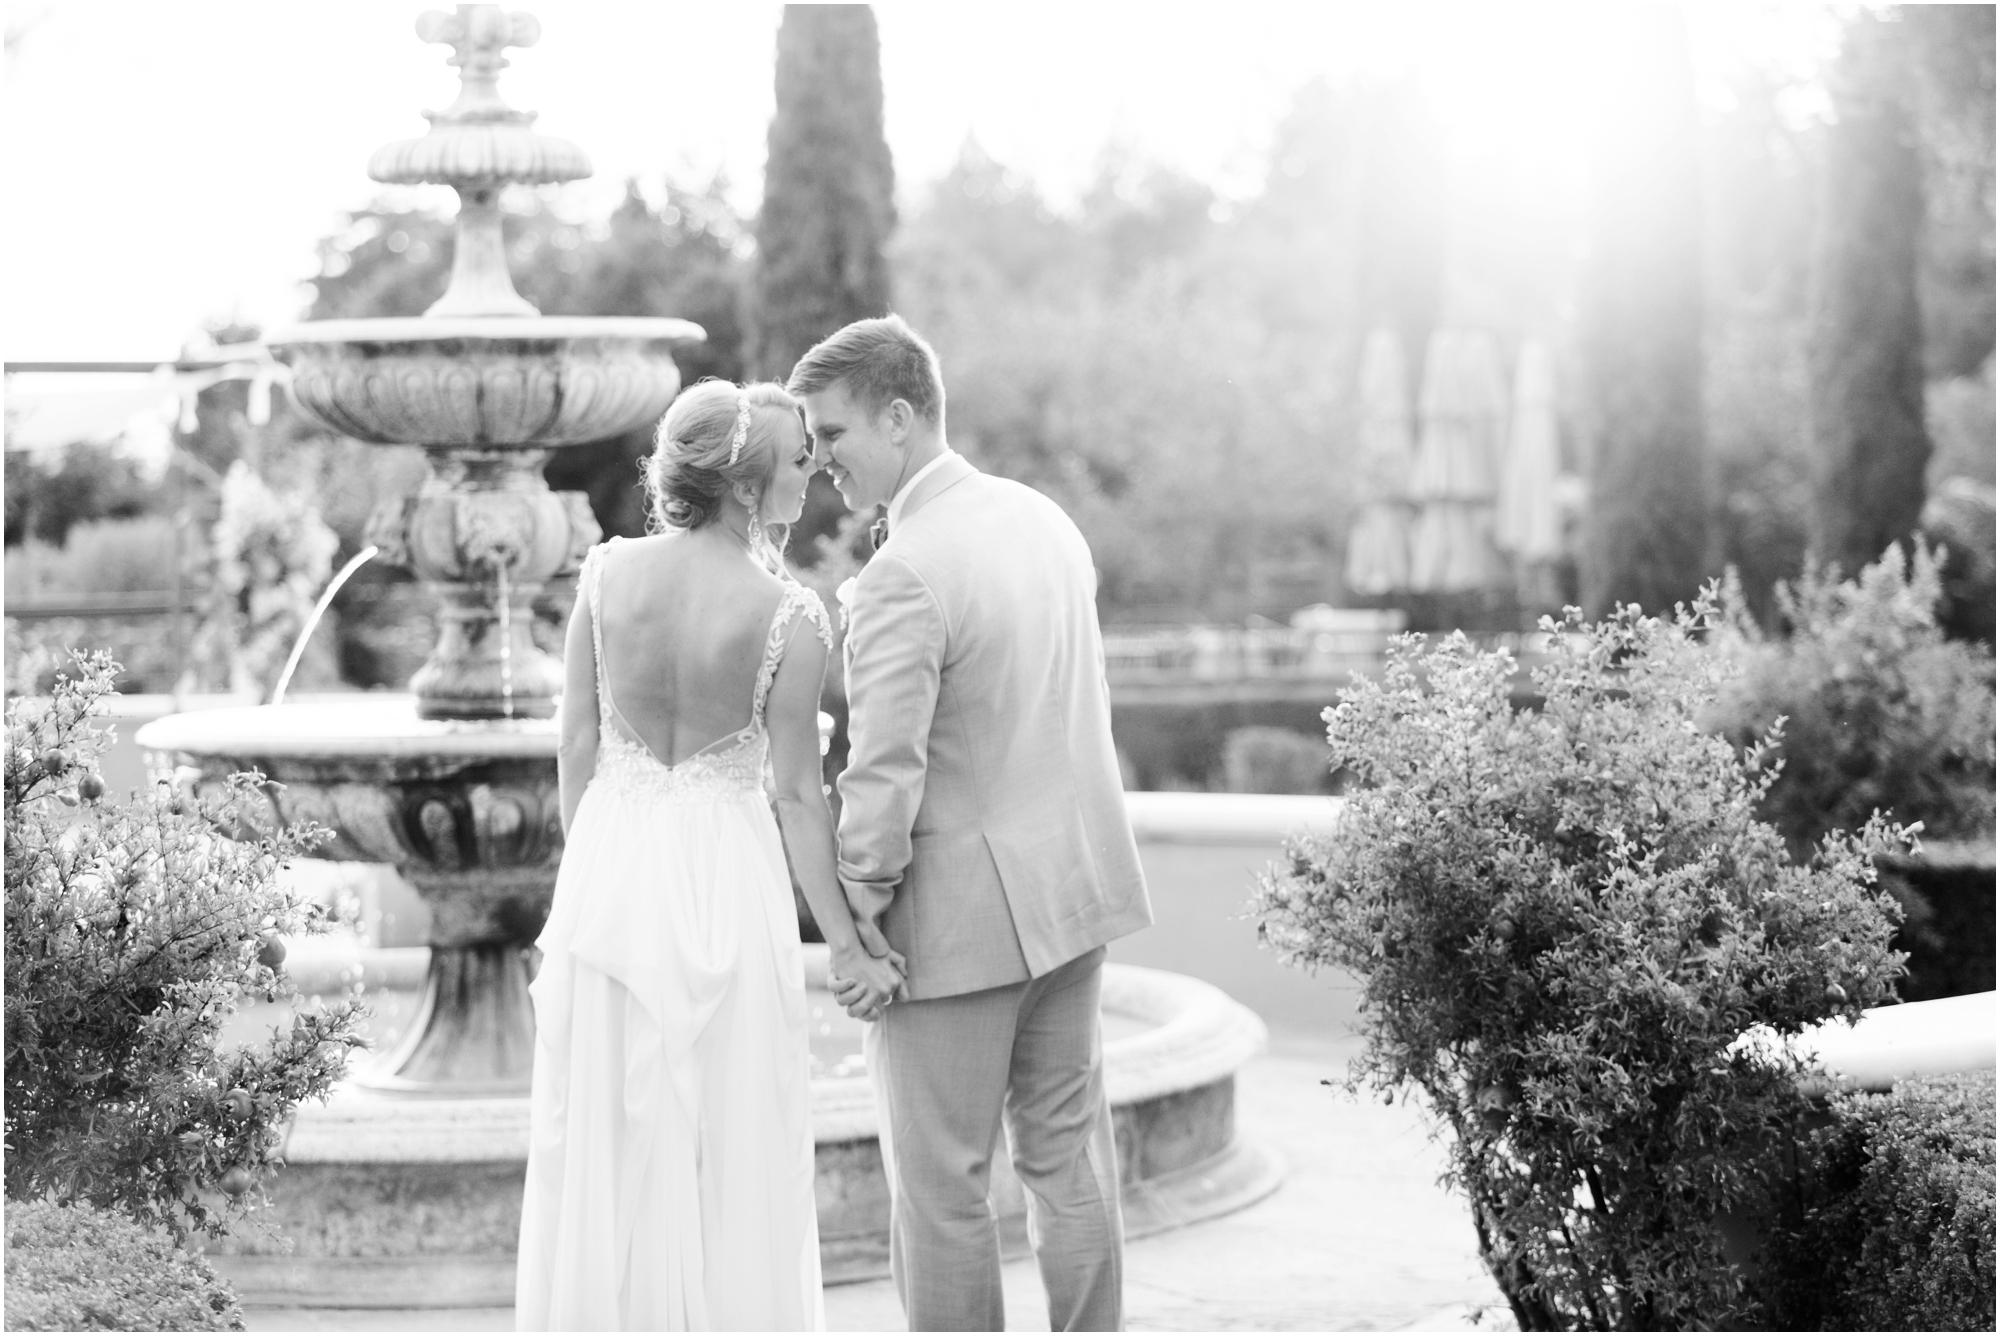 Regale Winery Wedding photos by Briana Calderon Photography_0603.jpg